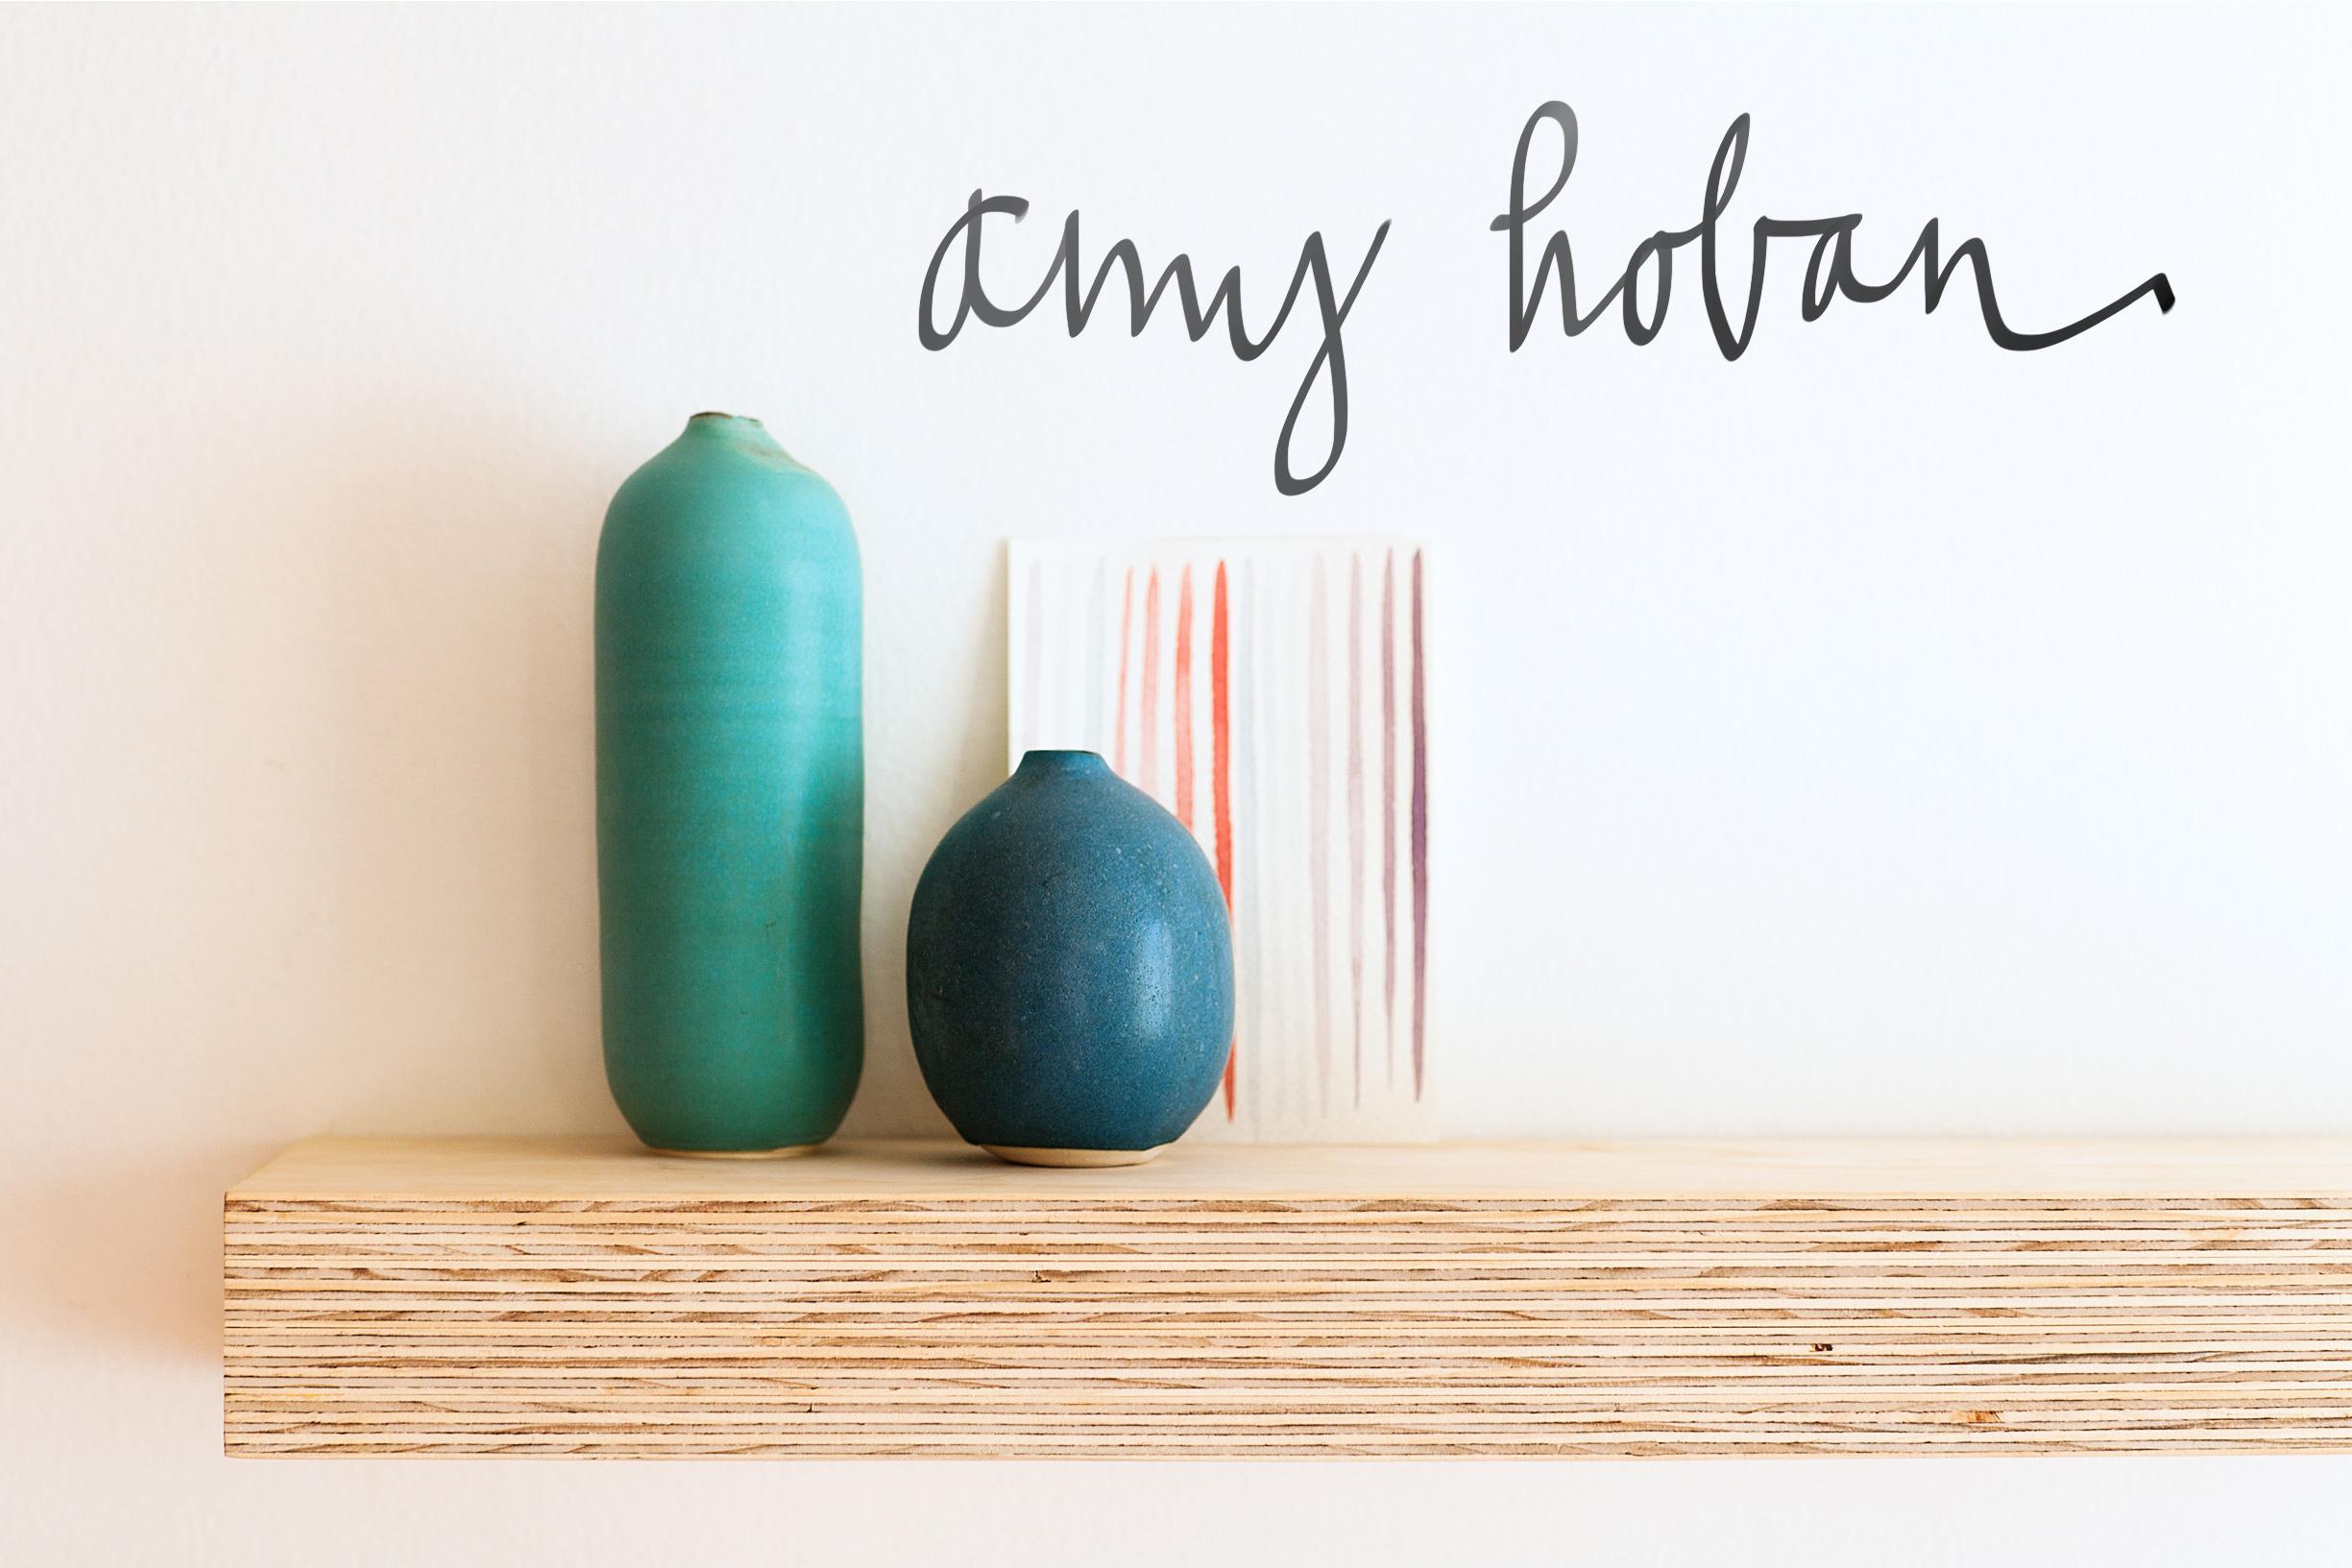 Amy Hoban on Smile Heart Love